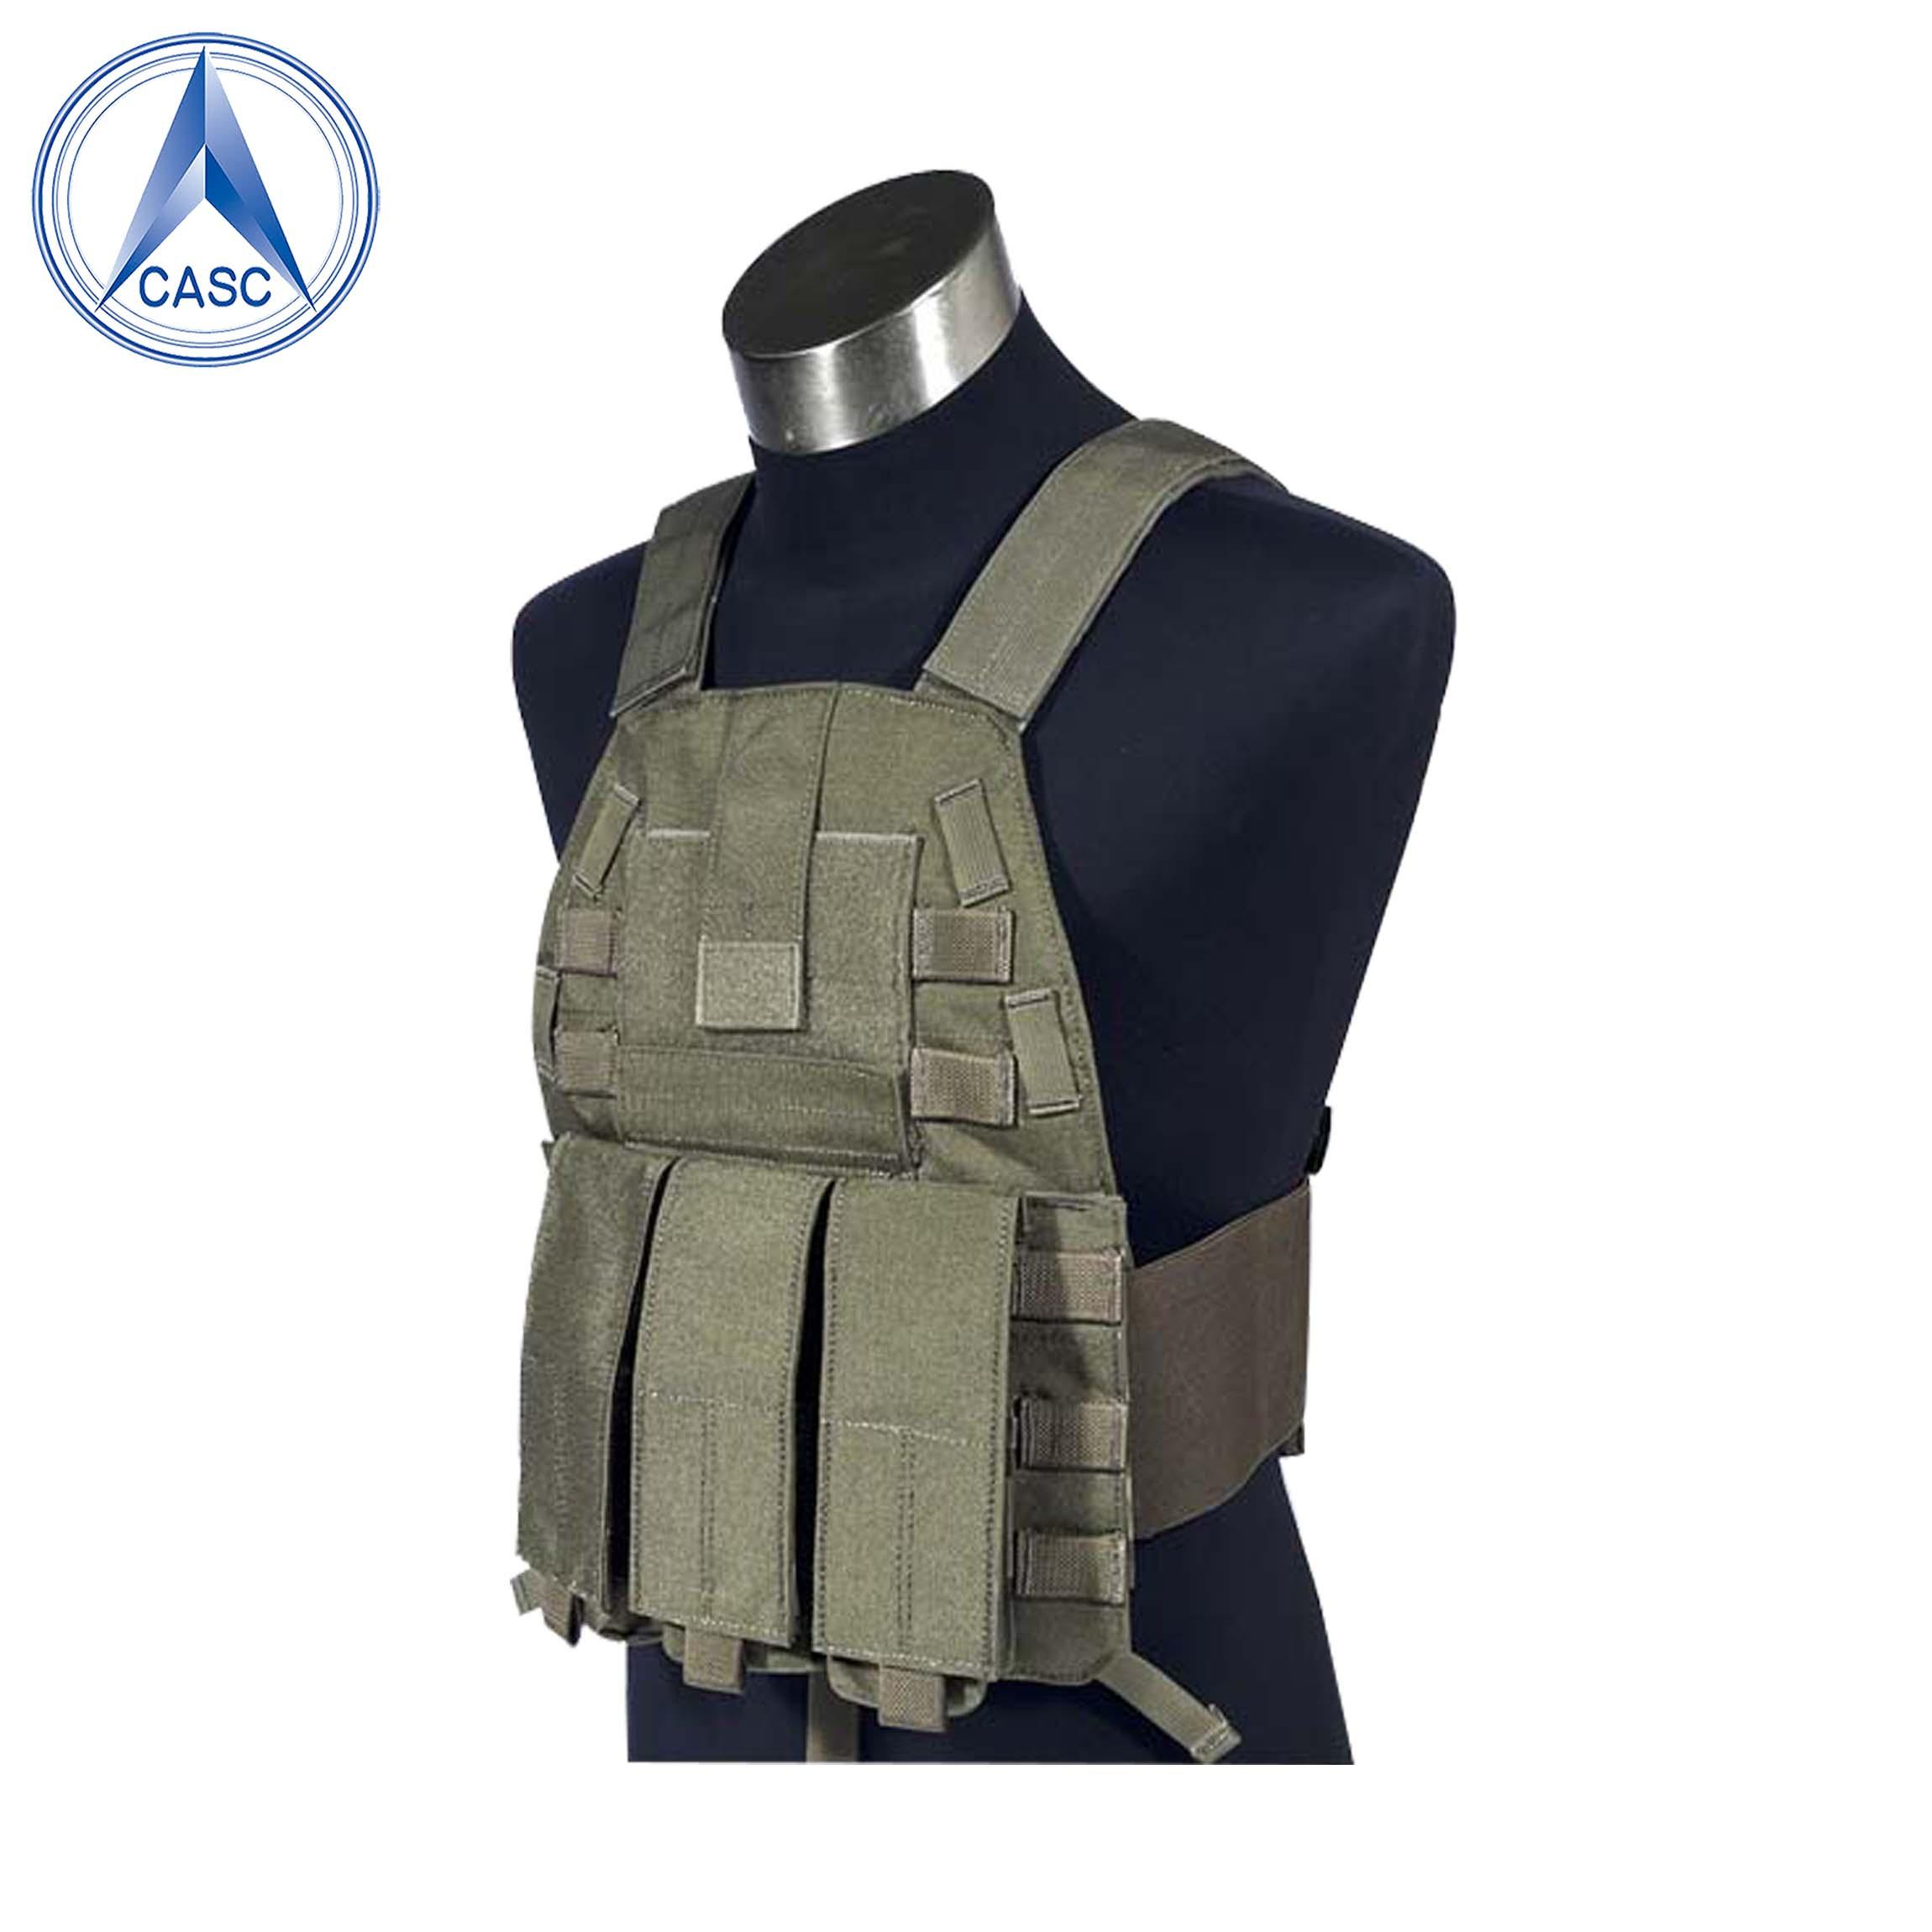 New XXL IIIA Tactical Plate Carrier Body Armor Bullet Proof Vest